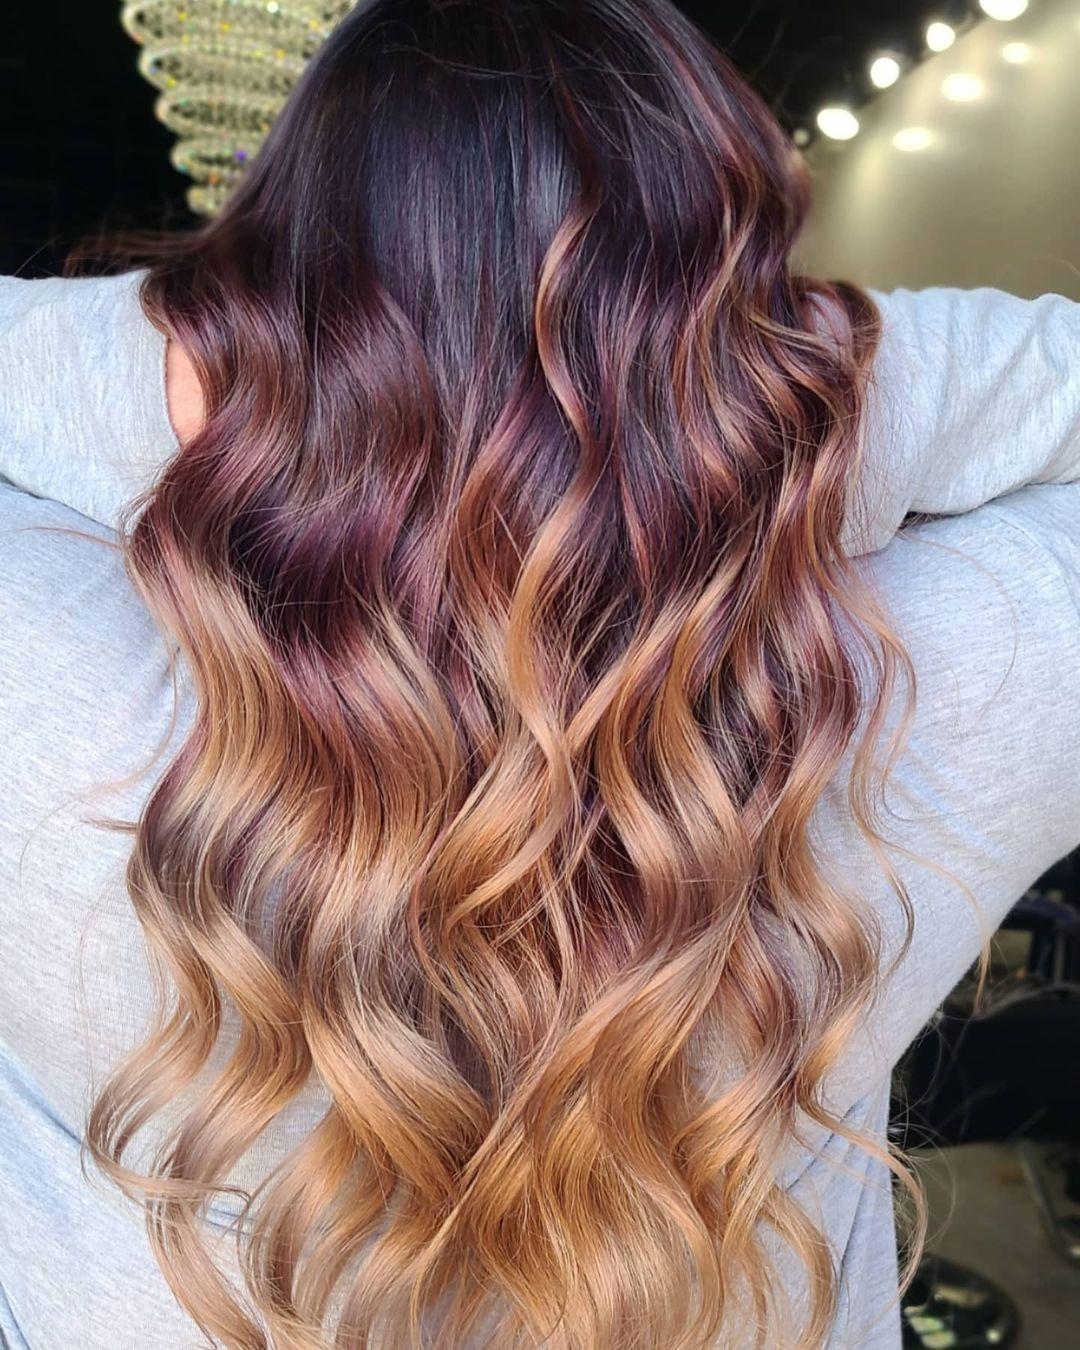 How to Make My Hair Shiny